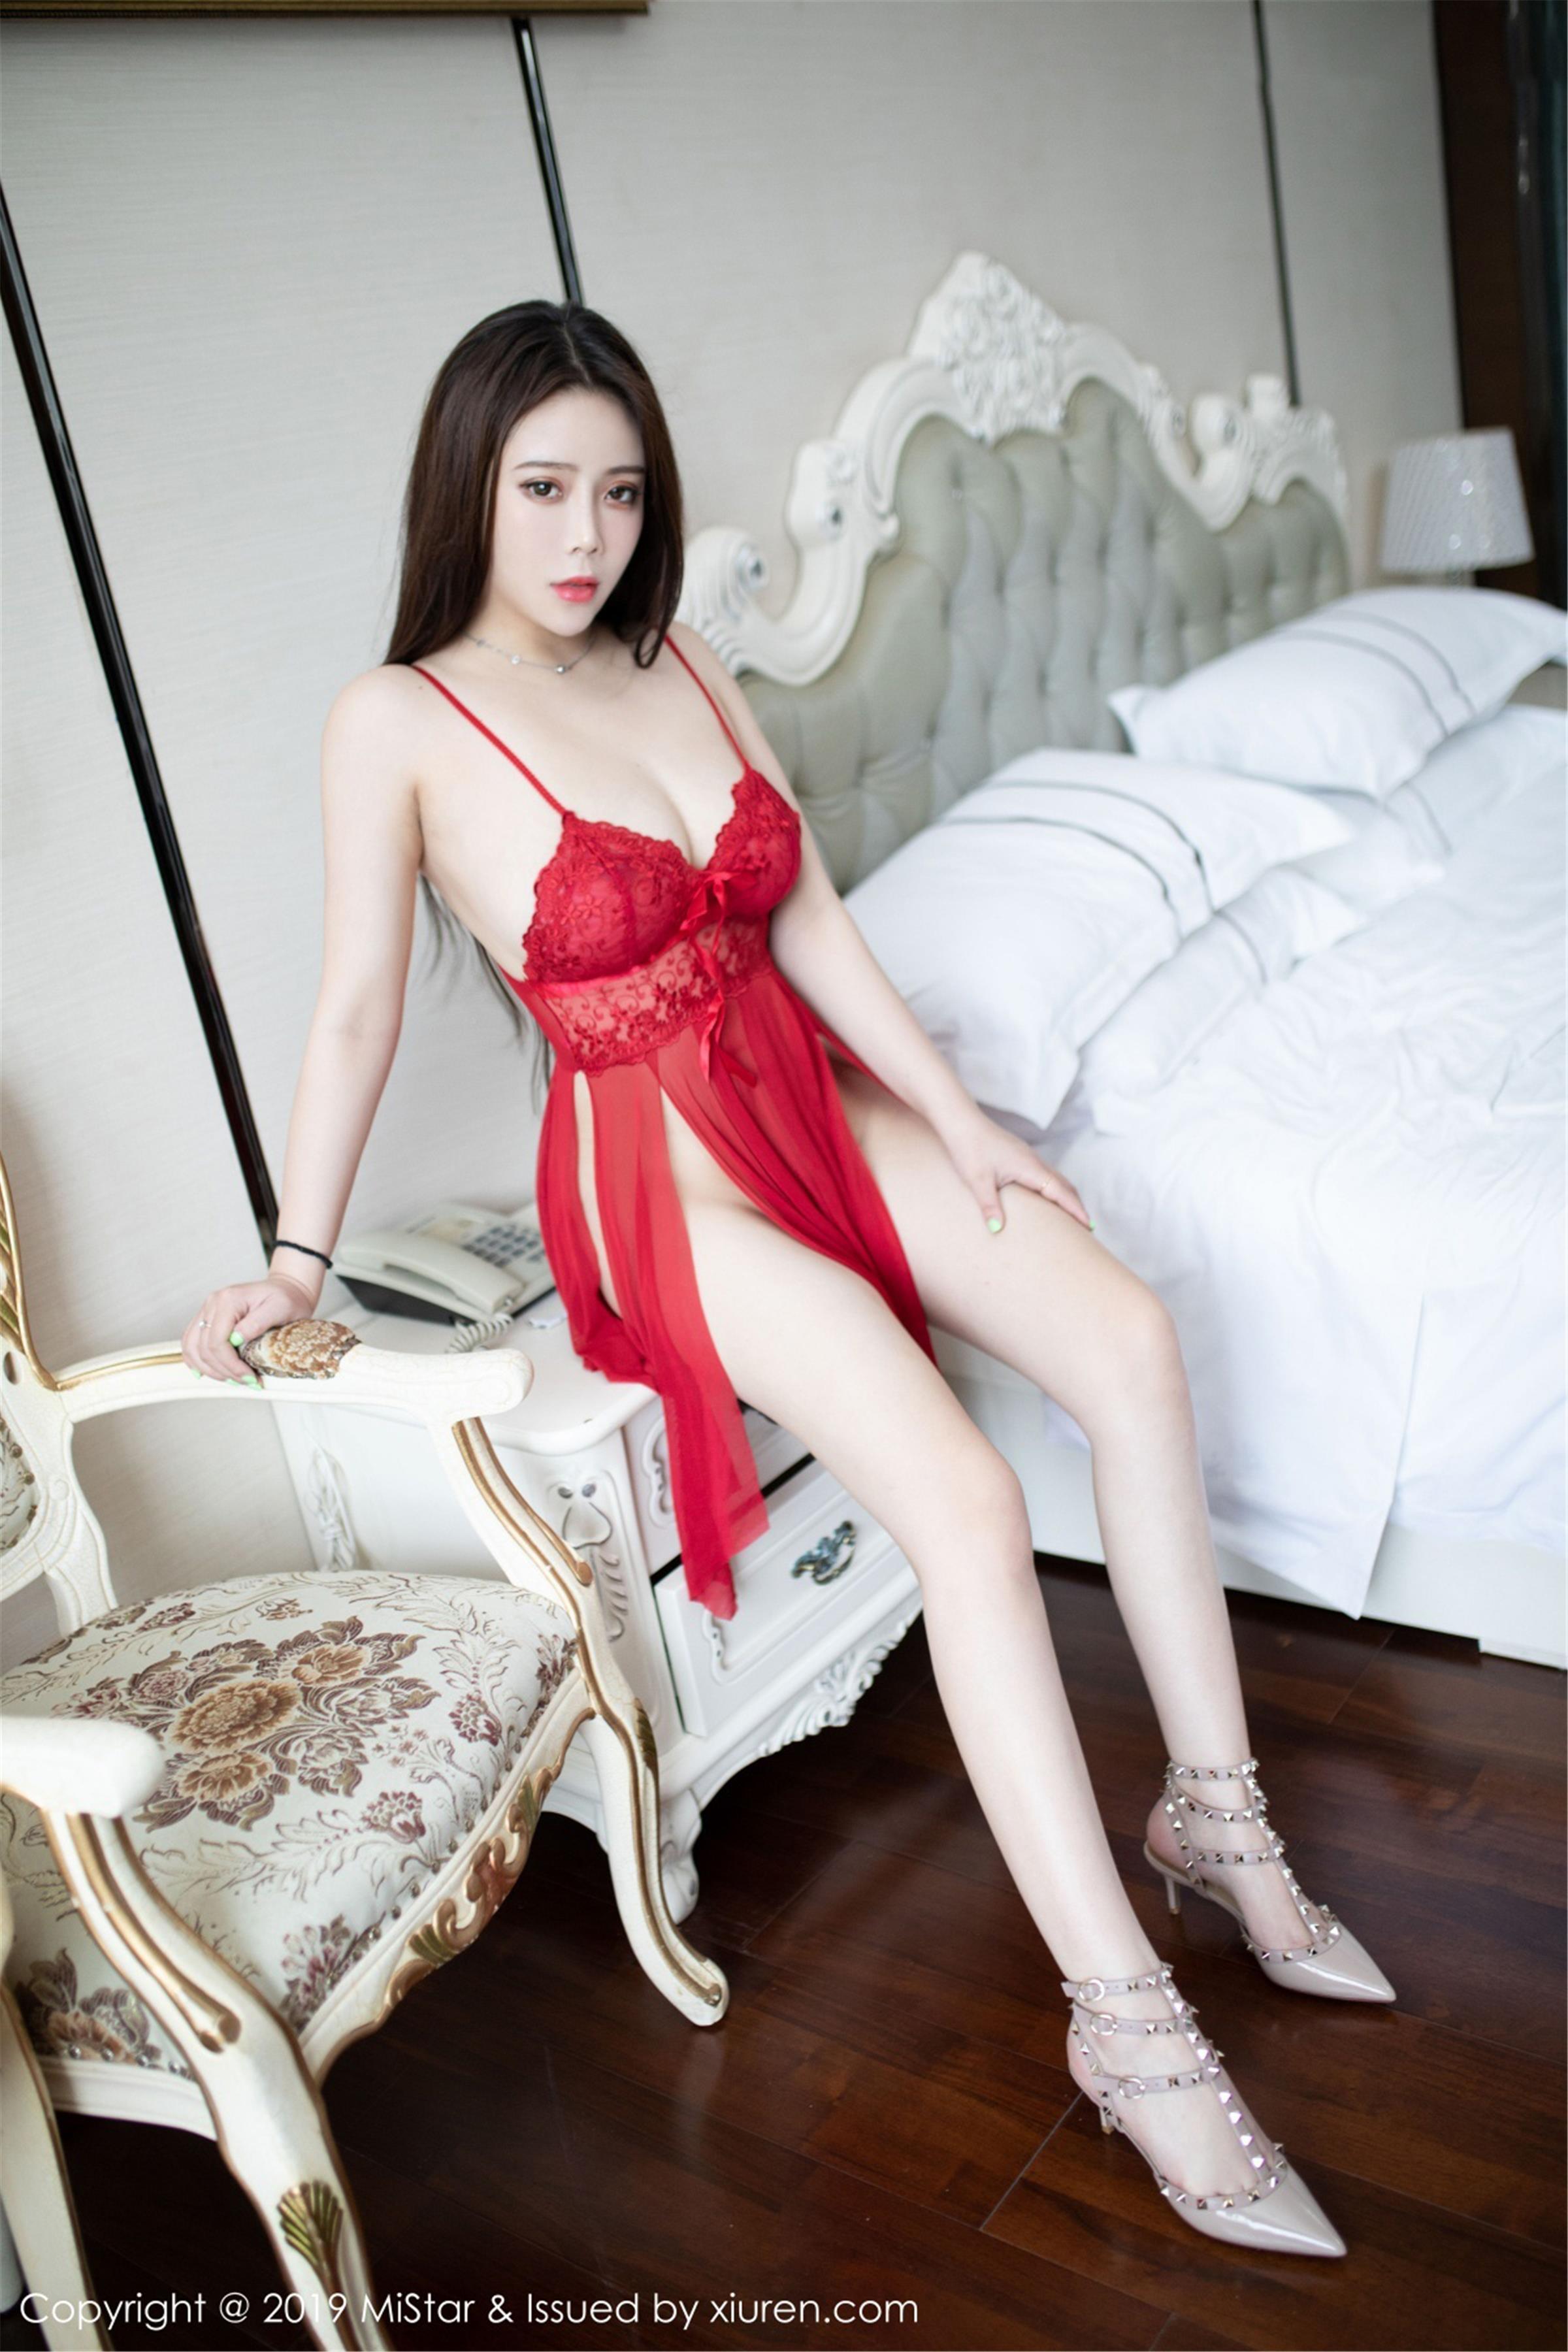 [MiStar魅妍社]MS20190430VOL0285 Miki兔 红色蕾丝情趣内衣性感私房写真集